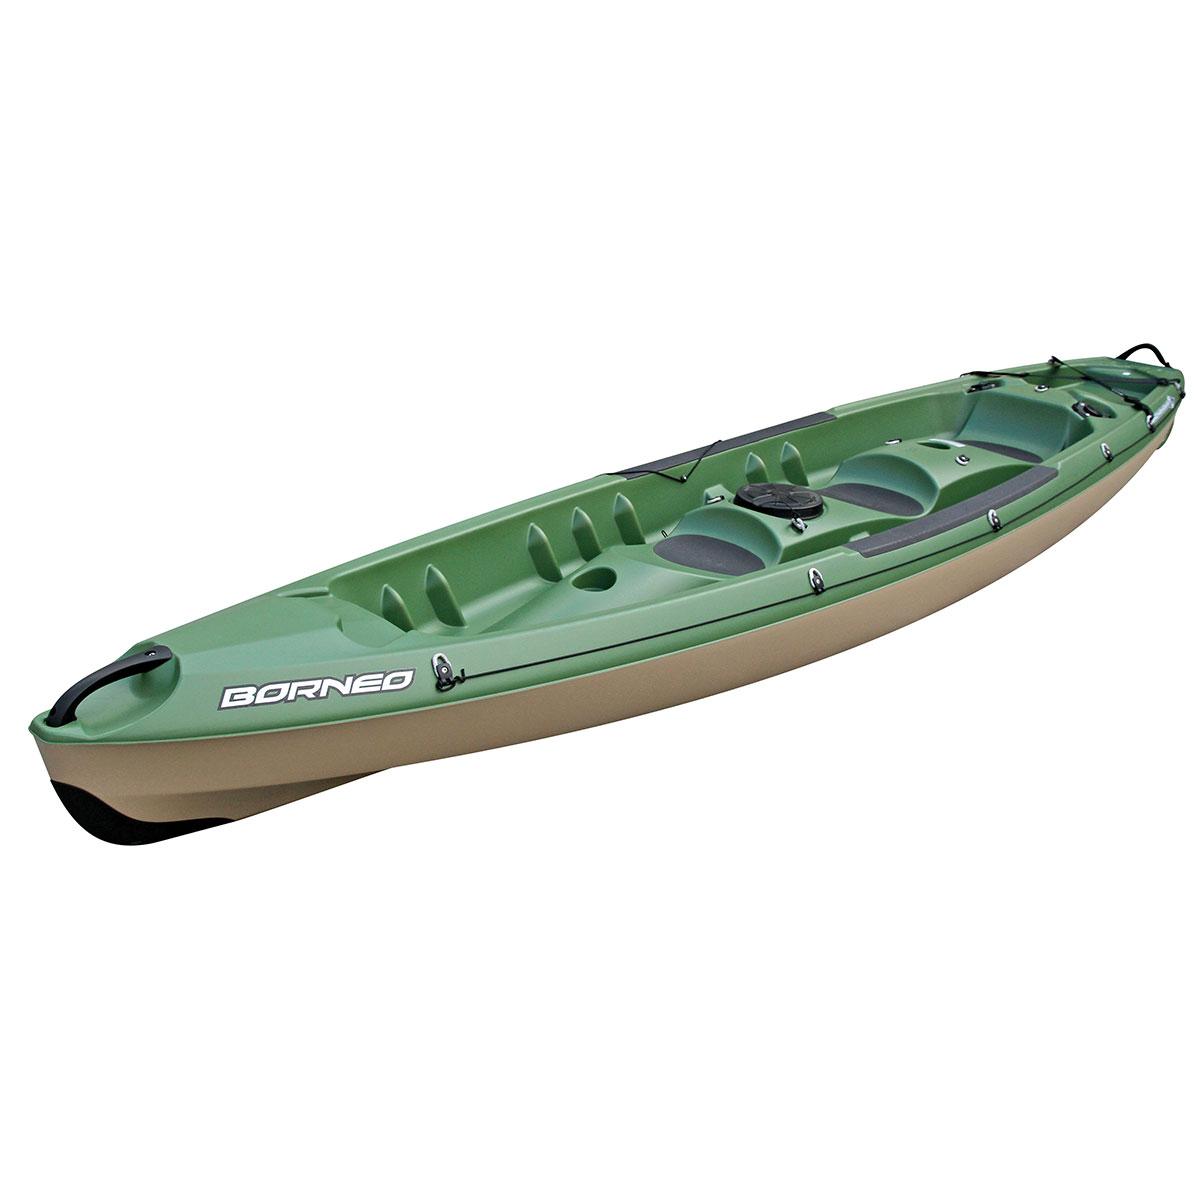 Bic borneo sit on top kayak maxtrack for Fishing kayak brands